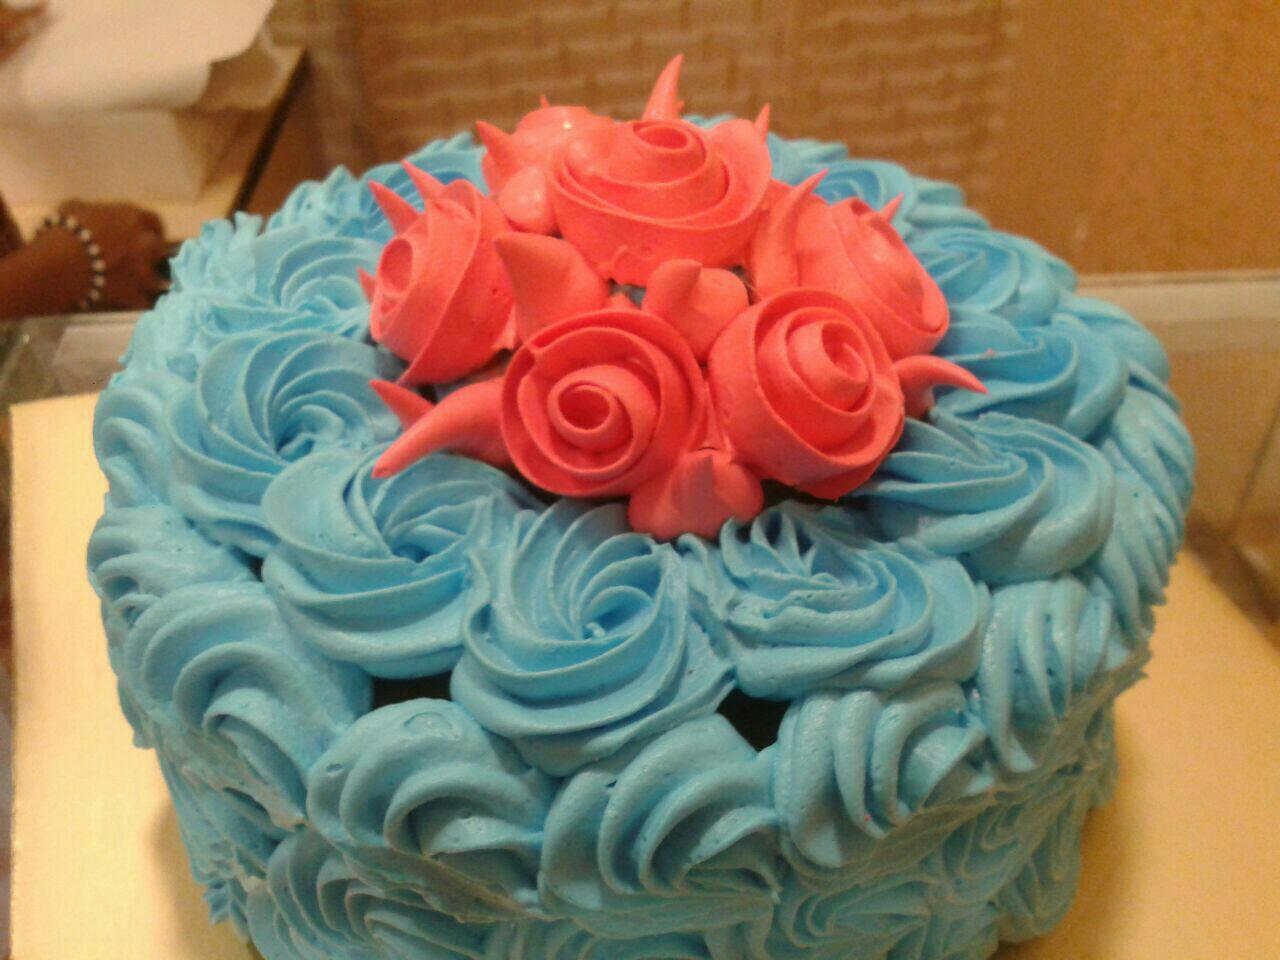 Cake O Licious Borivali